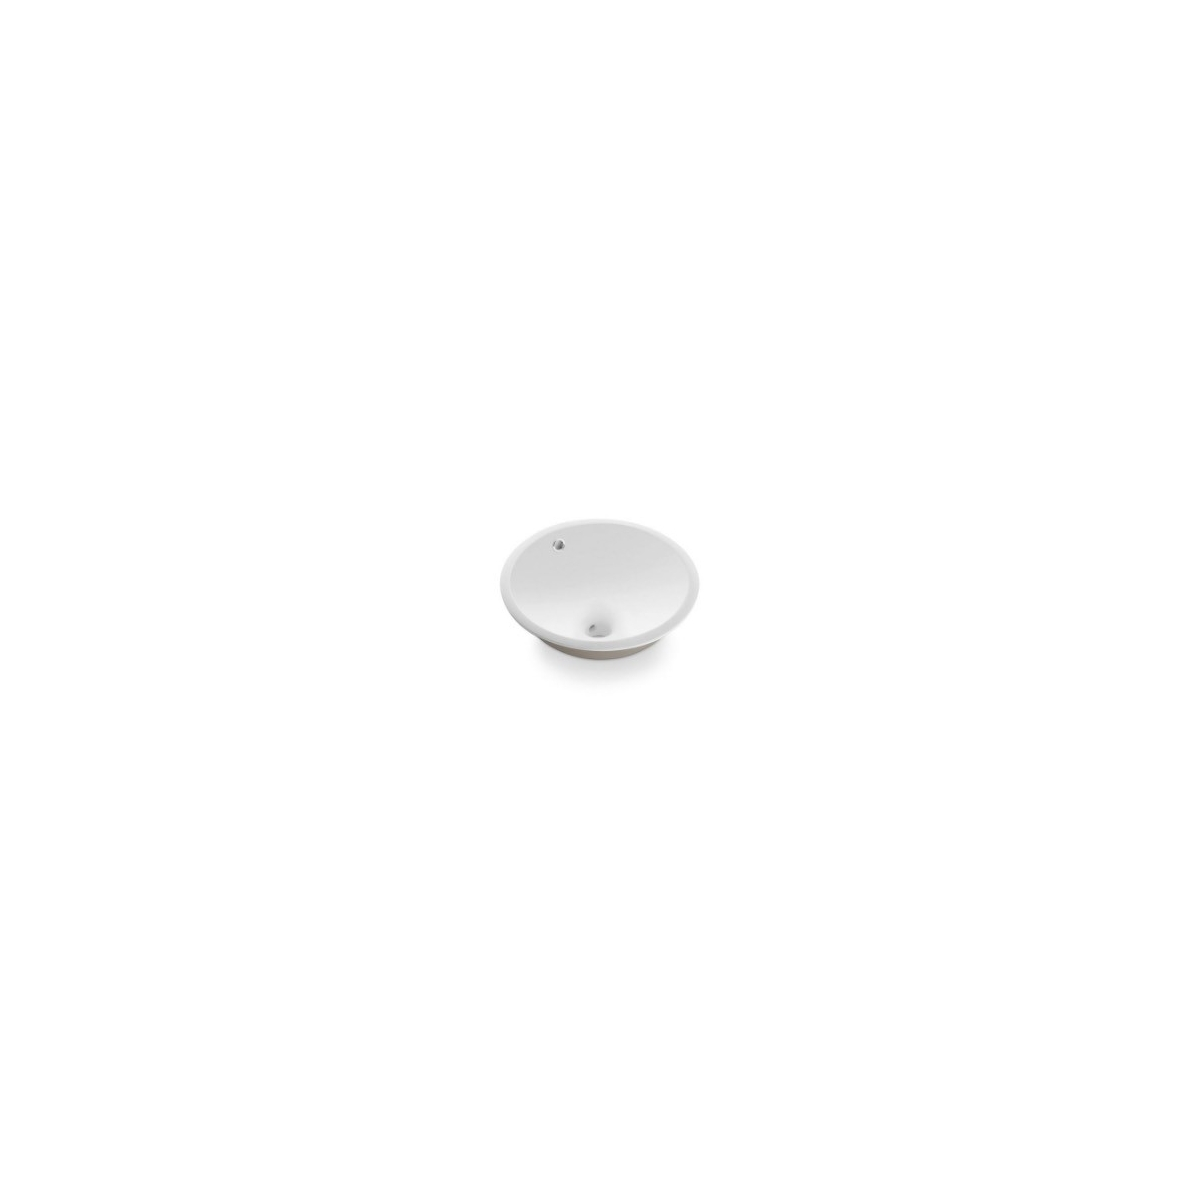 Lavabo Circular Cerdeña - Lavabos circulares - Marca The Bathco